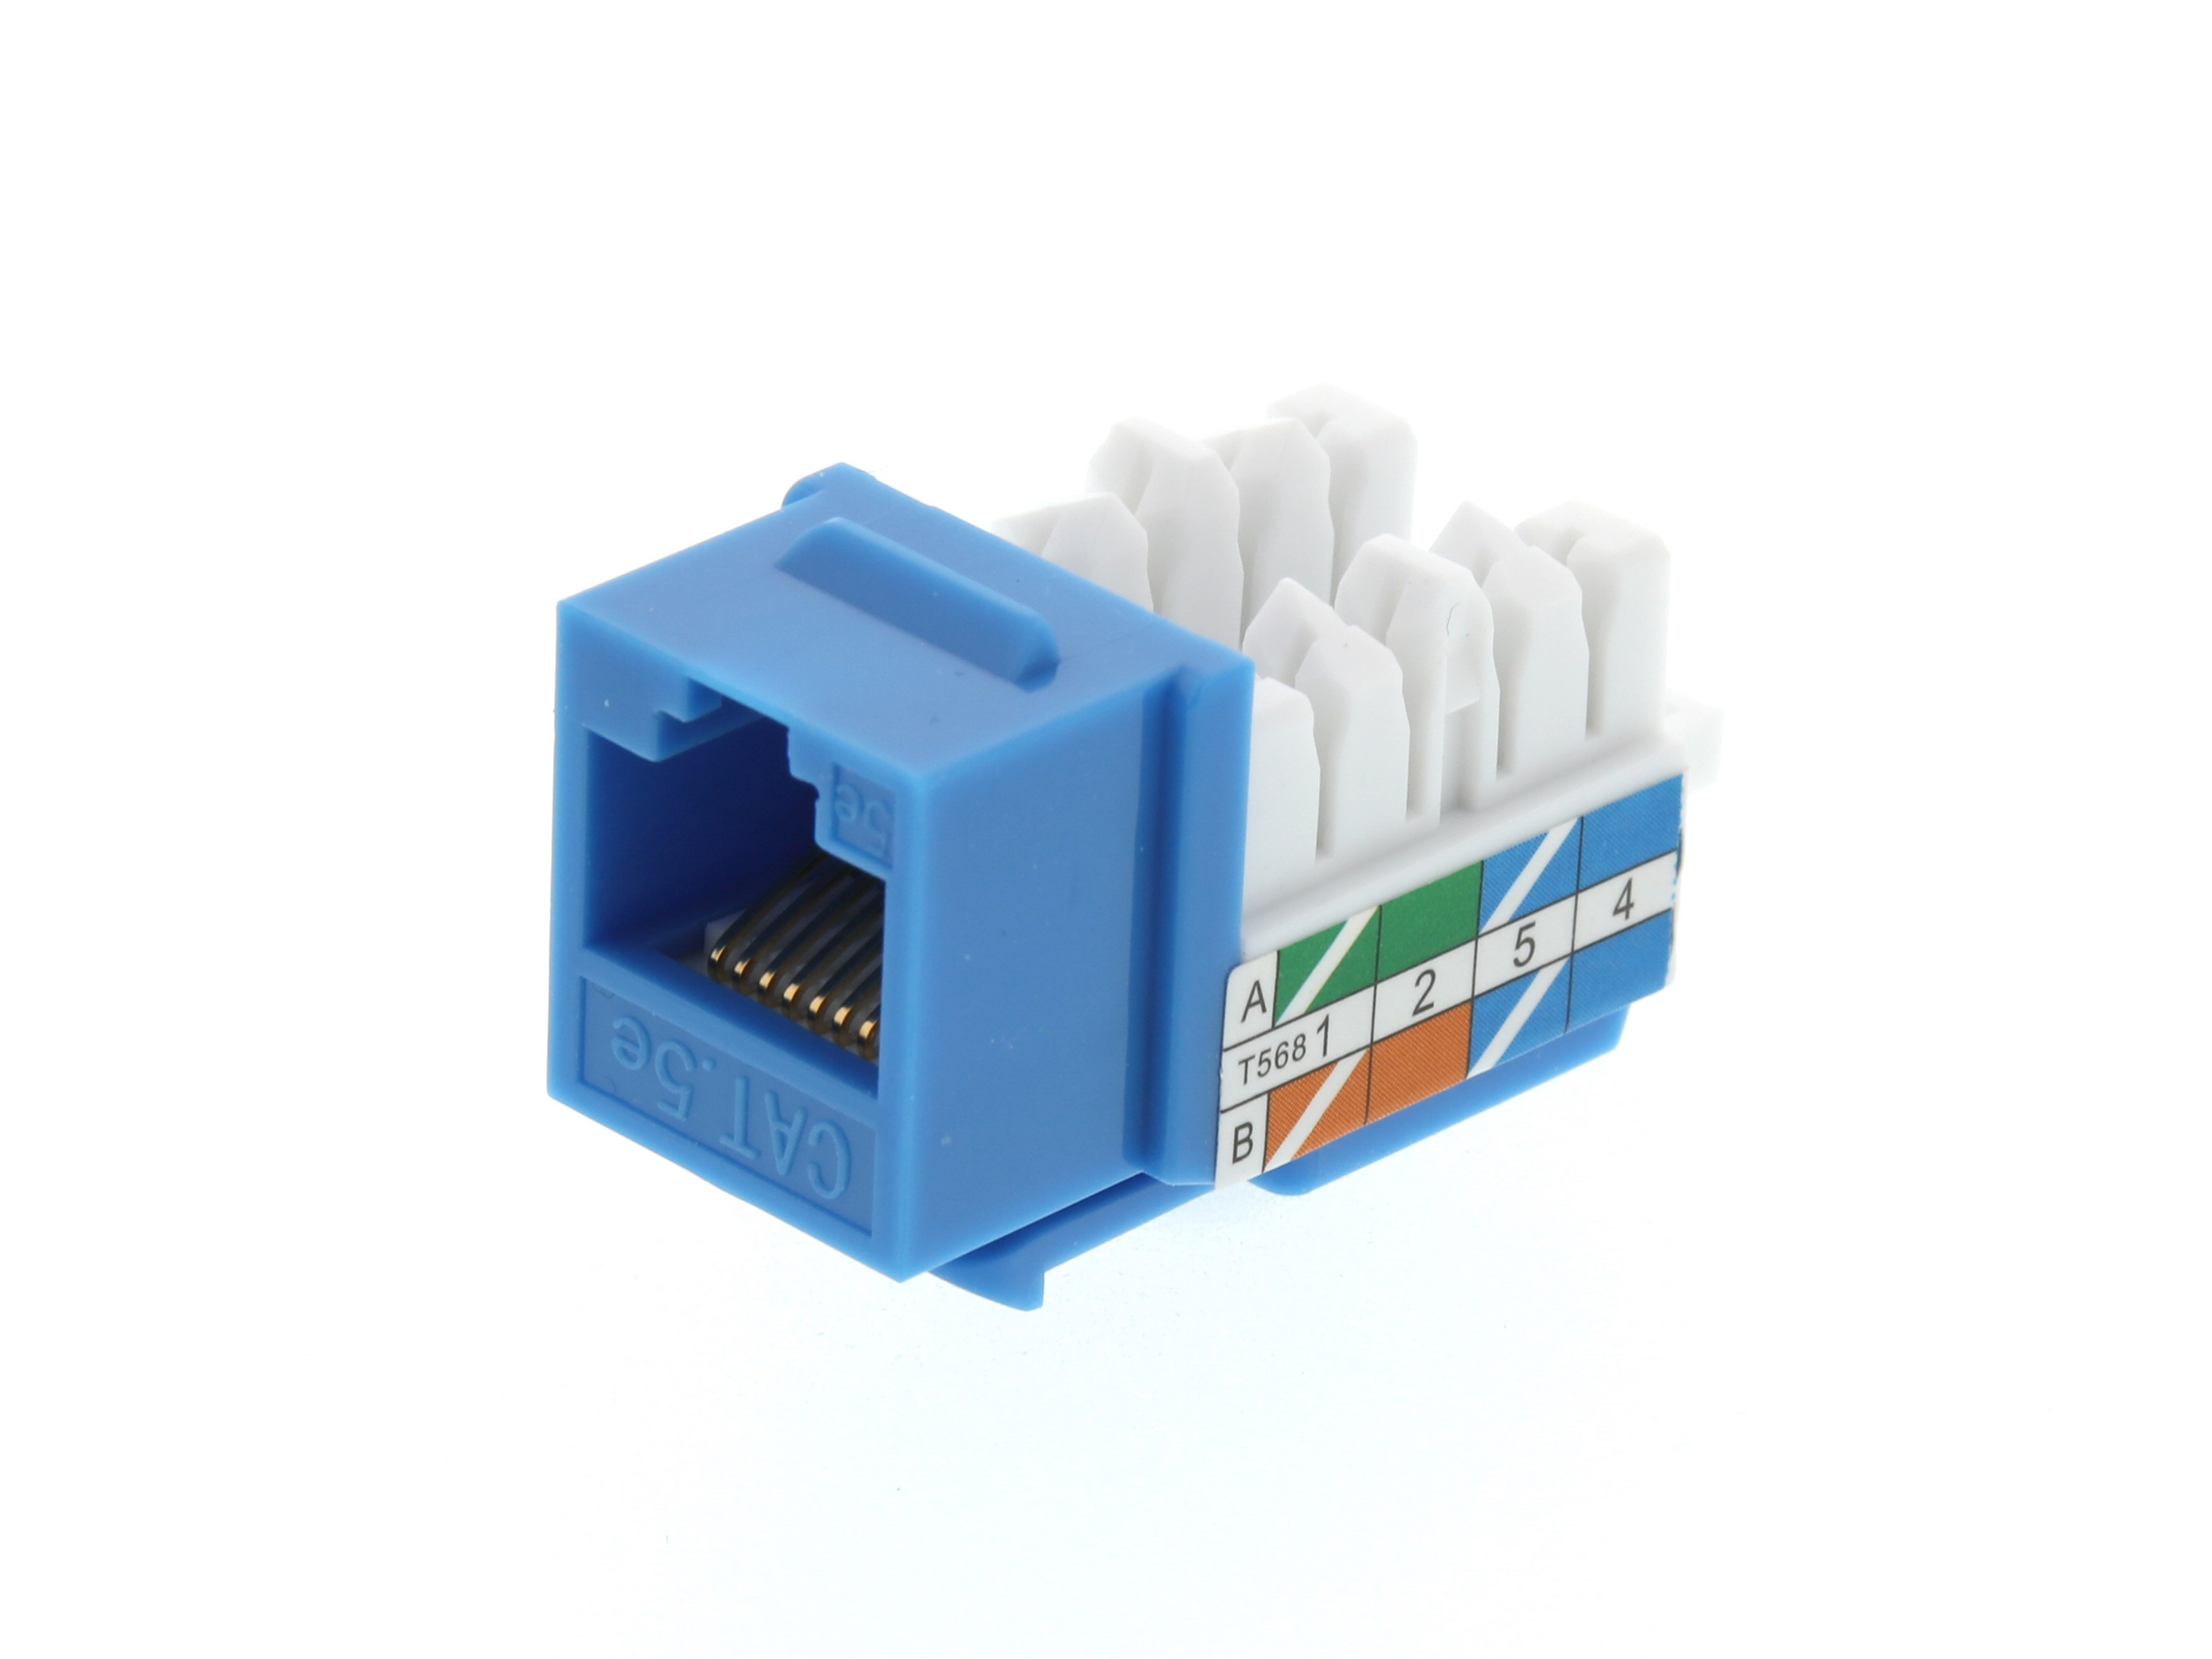 CAT5e Keystone Jack 90 Degree 110 UTP - Blue | Computer Cable Store